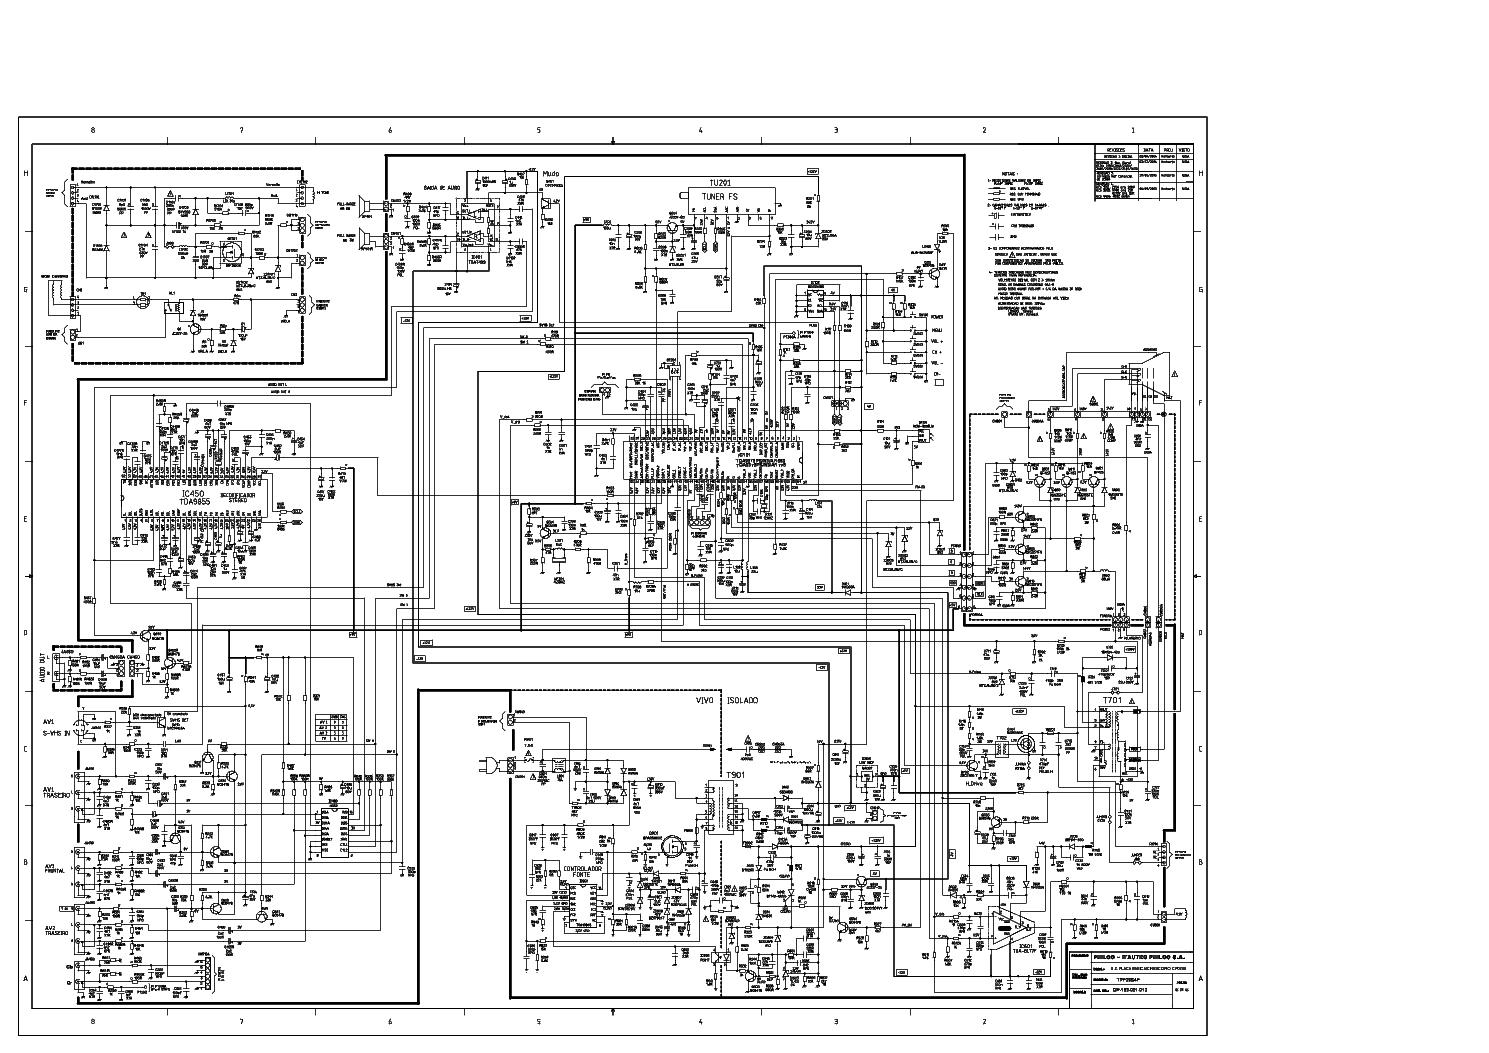 esquema tv philco tp-1452n